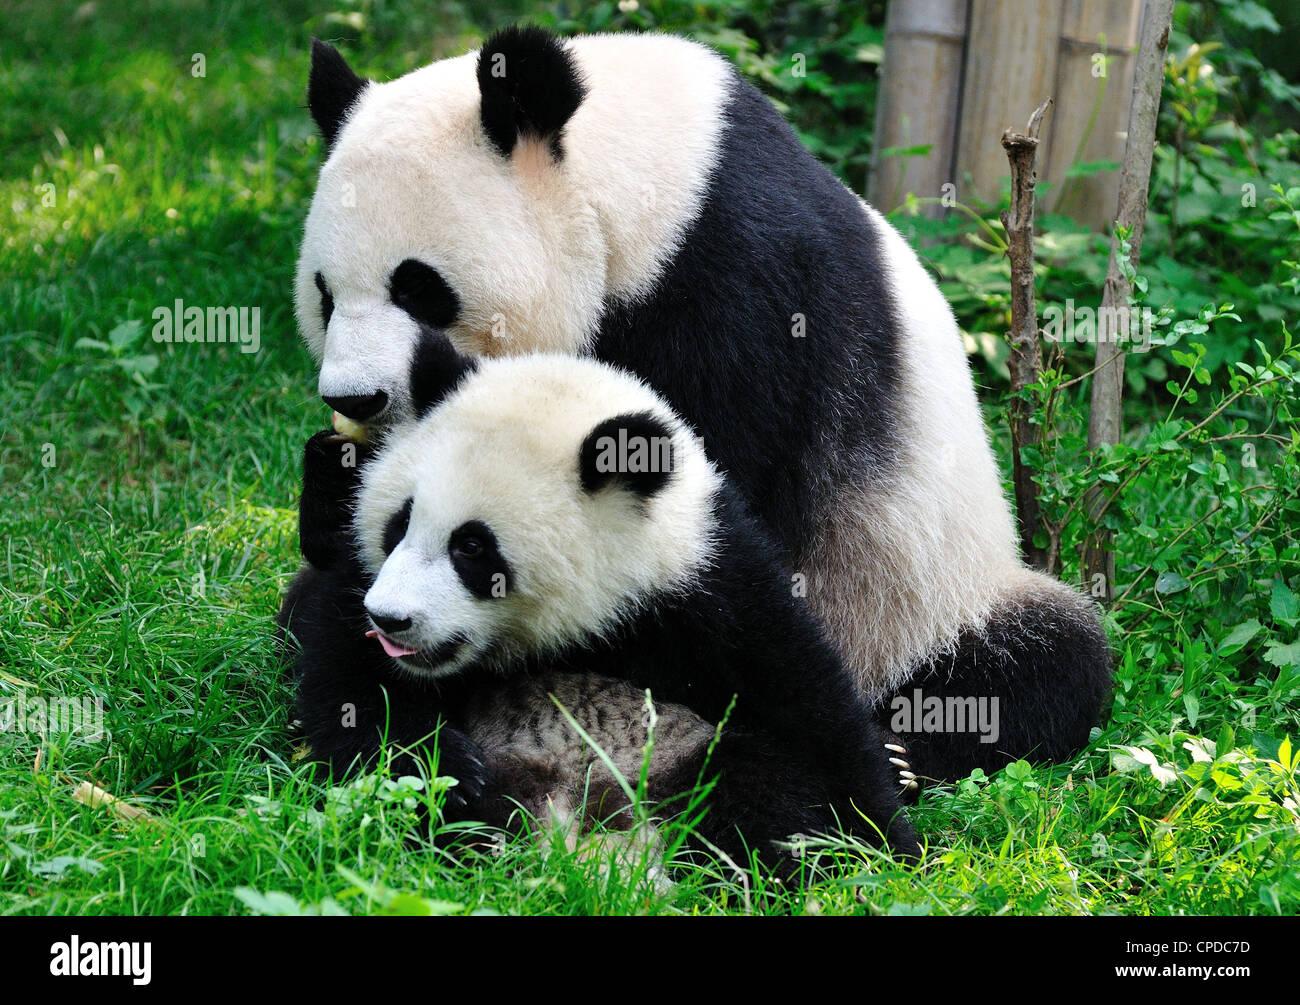 Panda mom and cub play on grass. Chengdu, Sichuan Province, China. - Stock Image